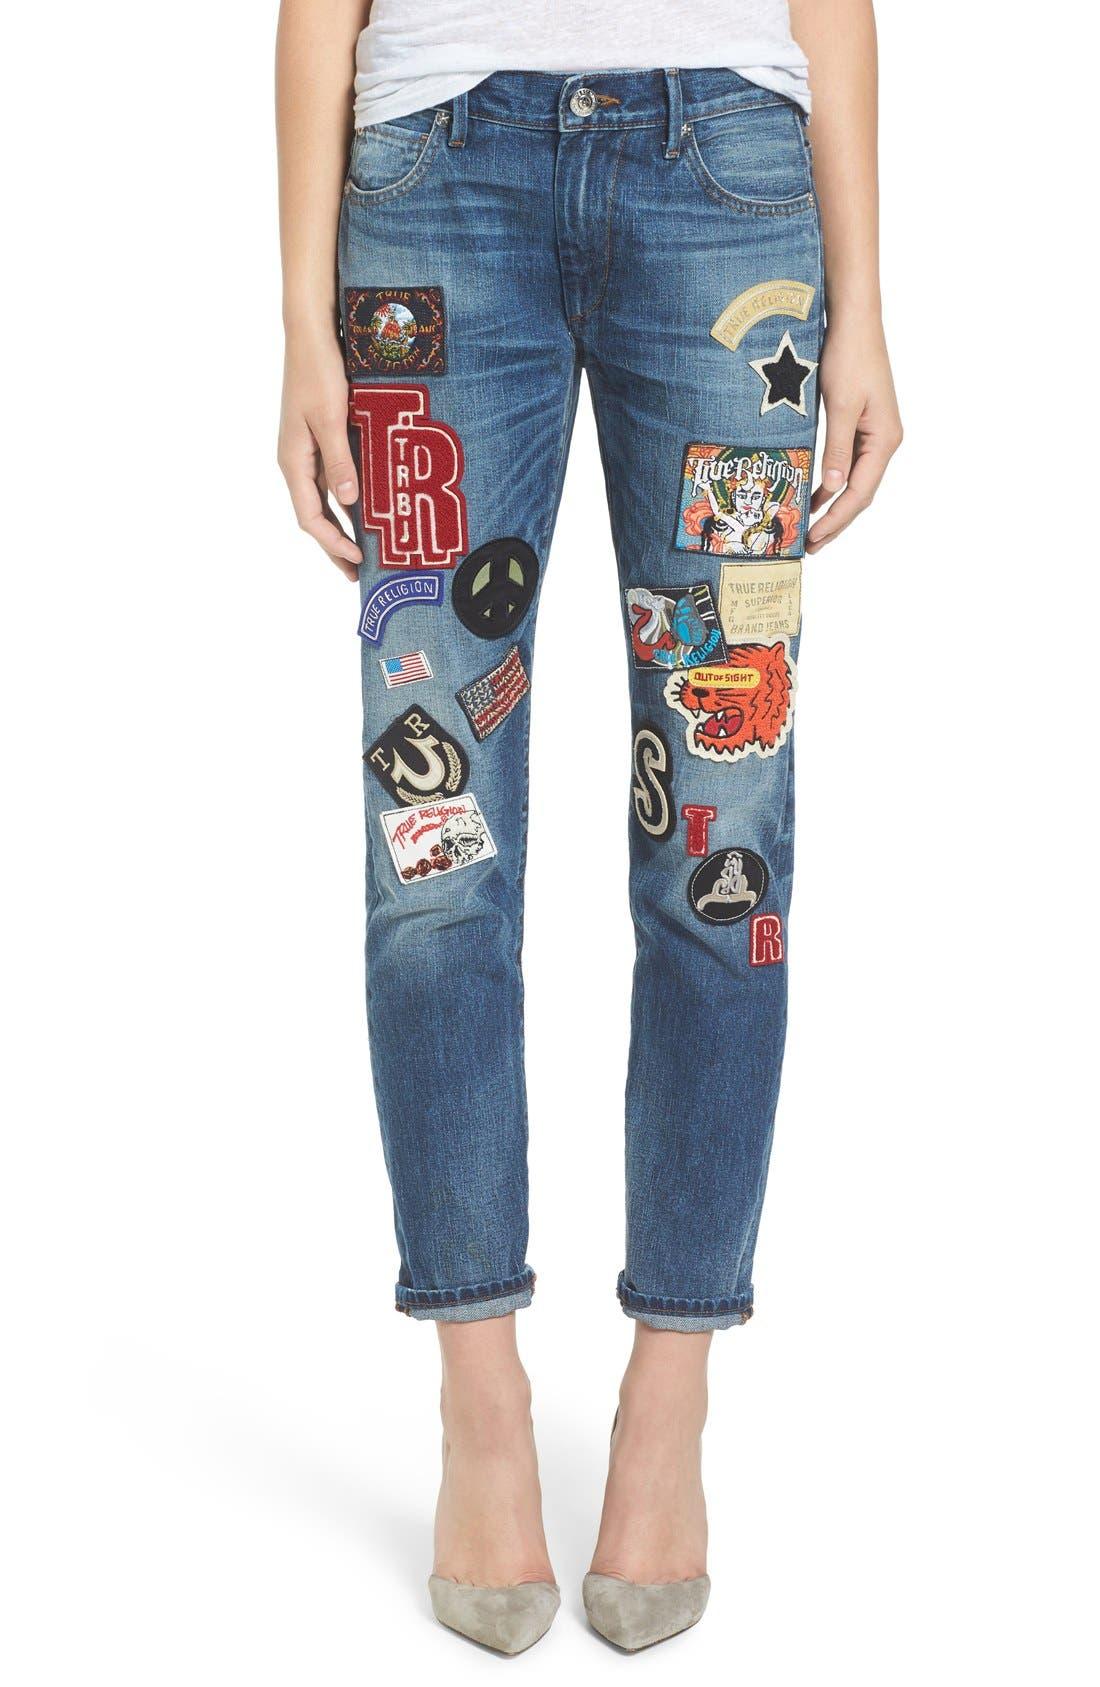 Main Image - True Religion Brand Jeans Audrey Slim Boyfriend Jeans (Coronet Blue)